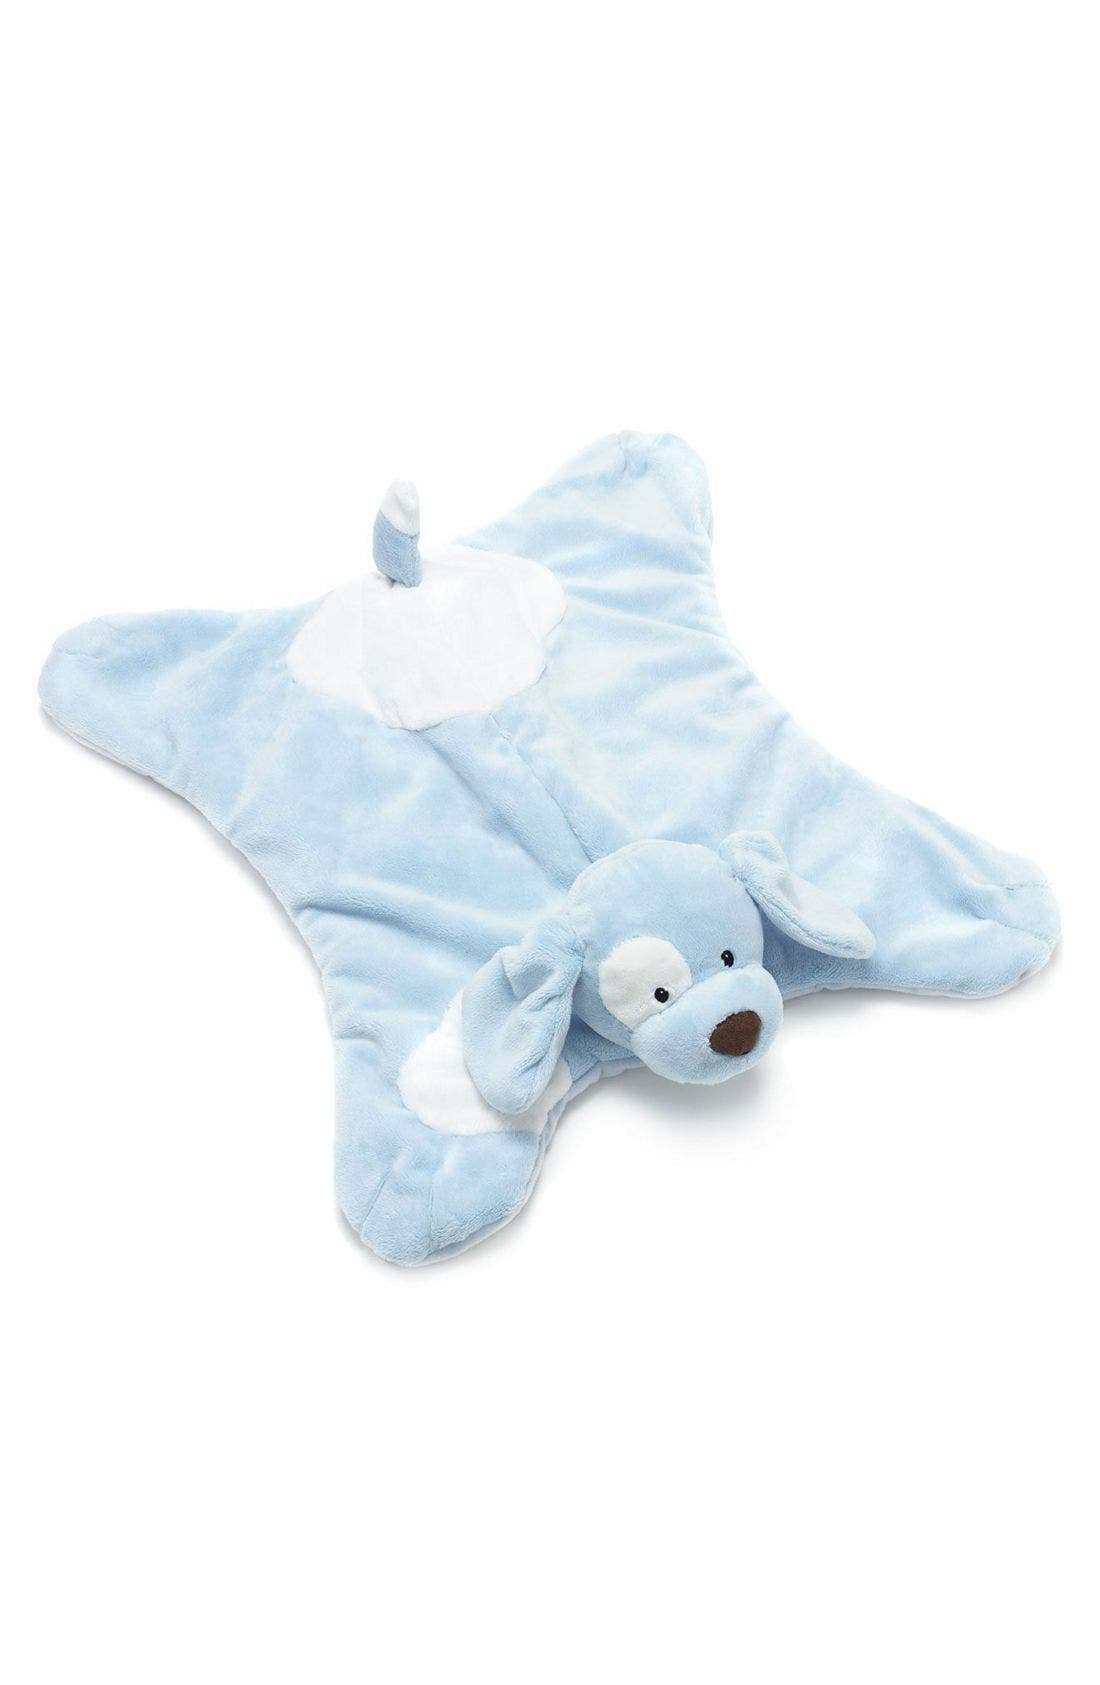 Alternate Image 1 Selected - Gund 'Comfy Cozy' Blanket